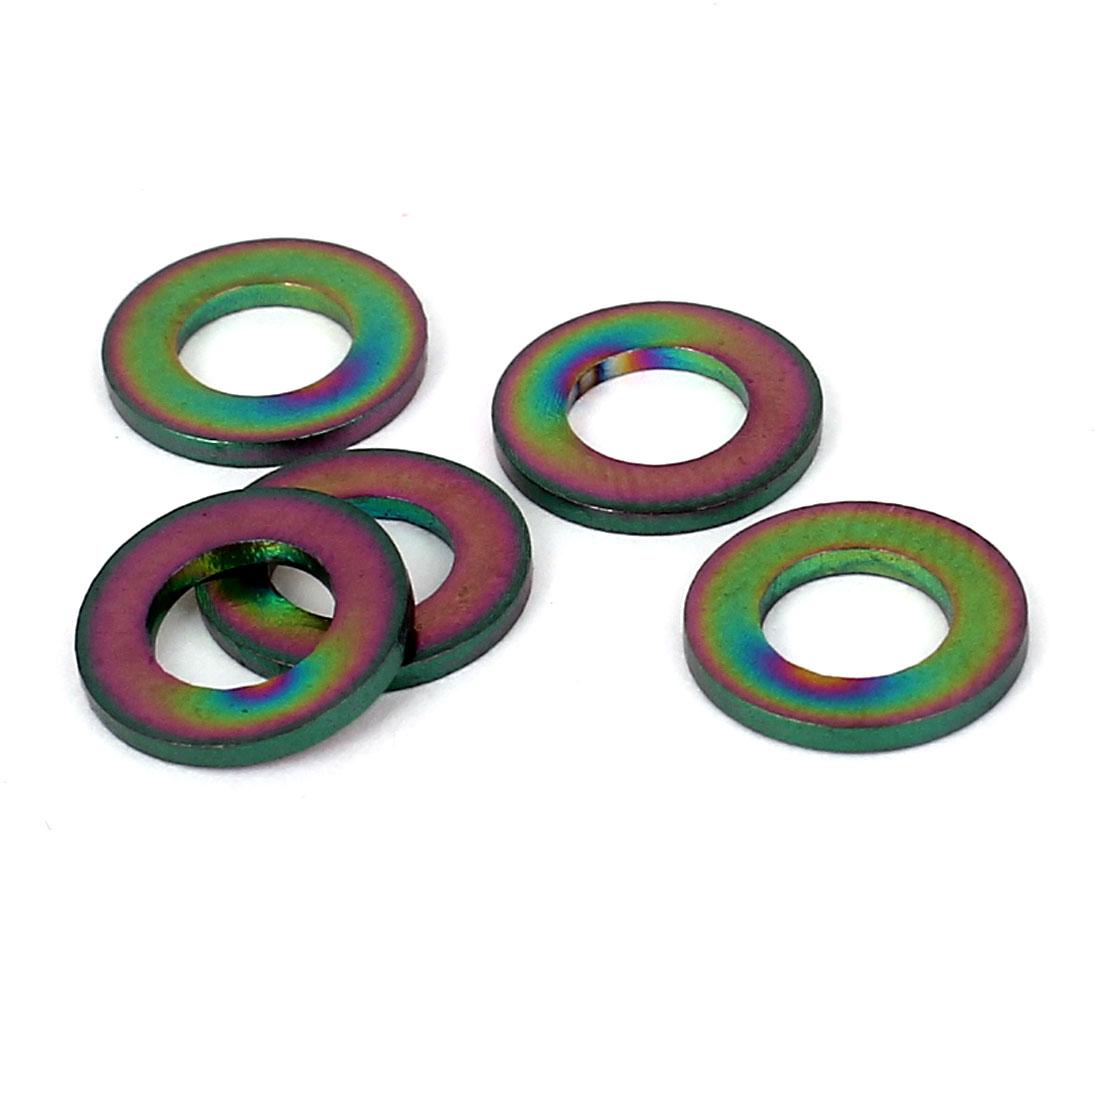 5pcs M5 Colorful Titanium Ti Metric Flat Washer DIN 125 for Bike Motorcycle Car